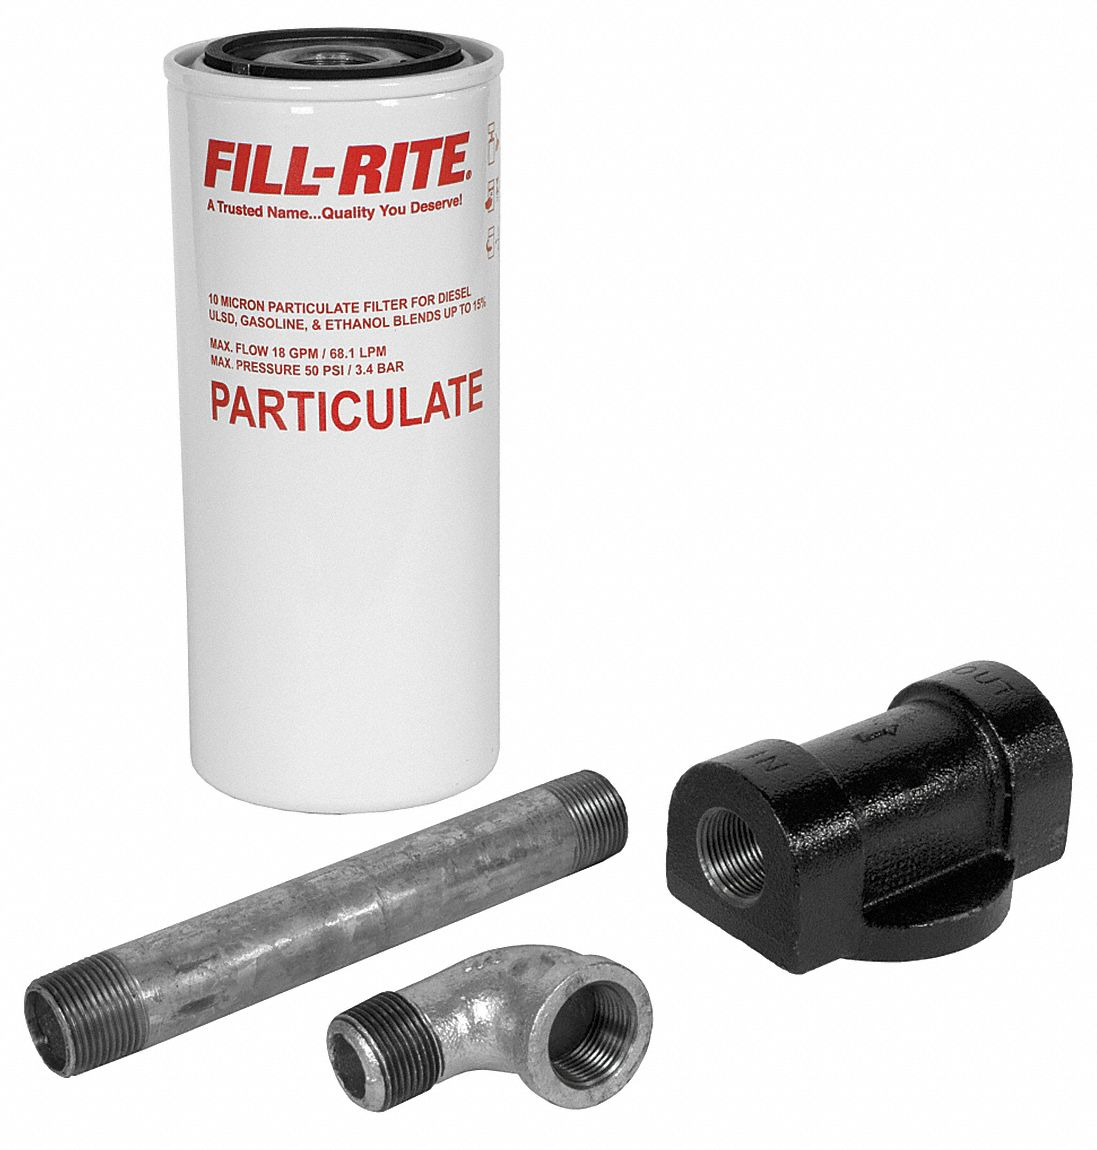 bosch fuel injection pump diagram fuel transfer pump filter fill-rite filter head fuel filter housing, 3/4